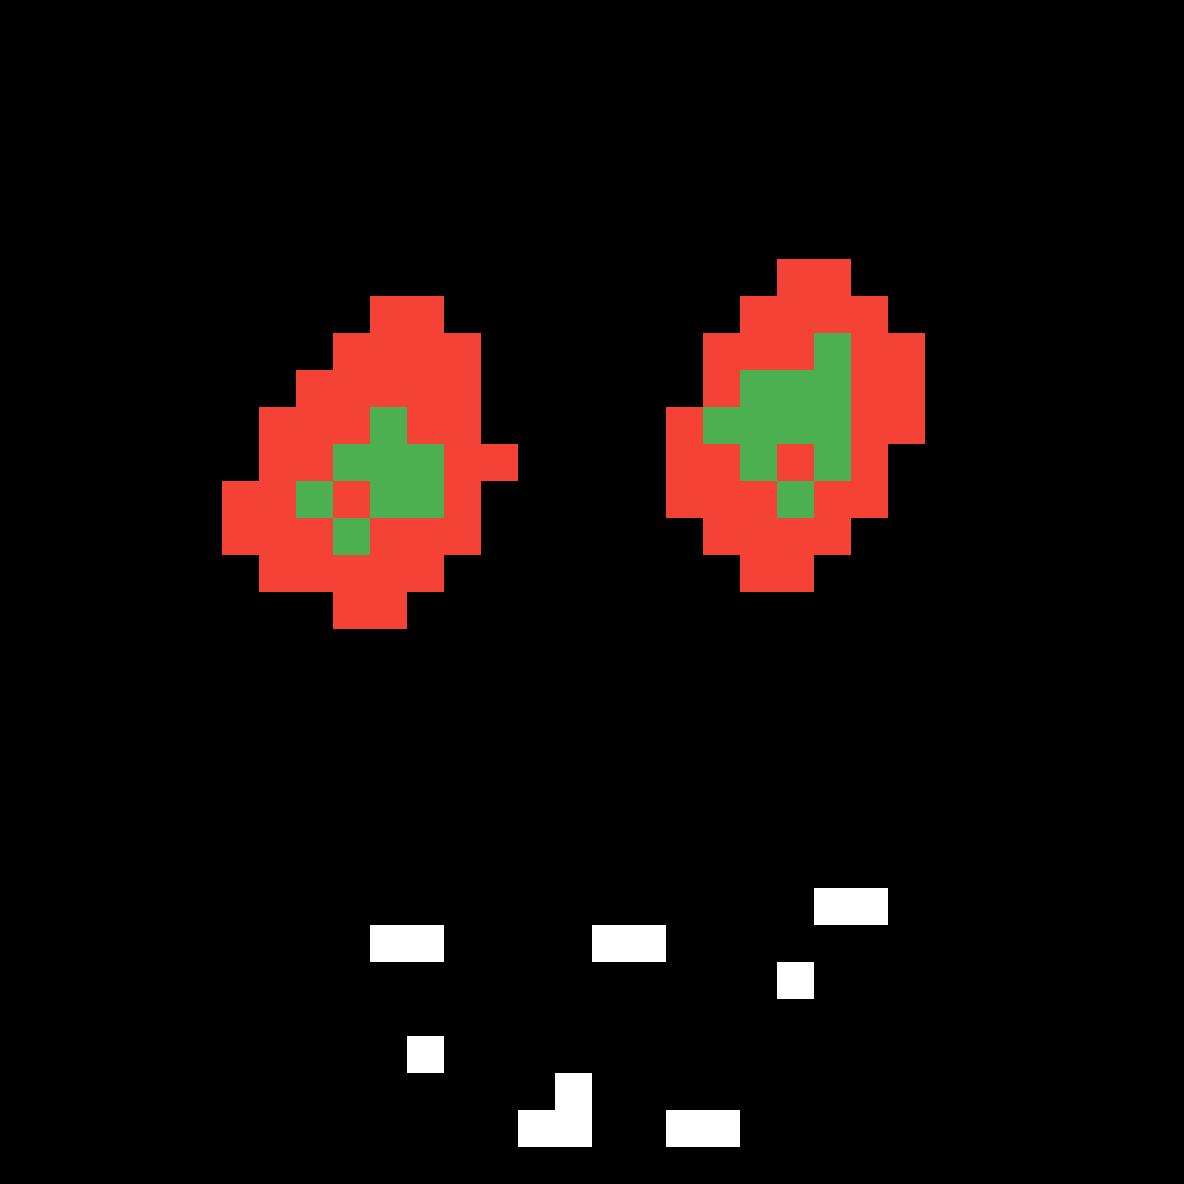 Pixilart Omega Flowey Face By Flowey123456 Anyone still needs that #body horror #doodle. pixilart omega flowey face by